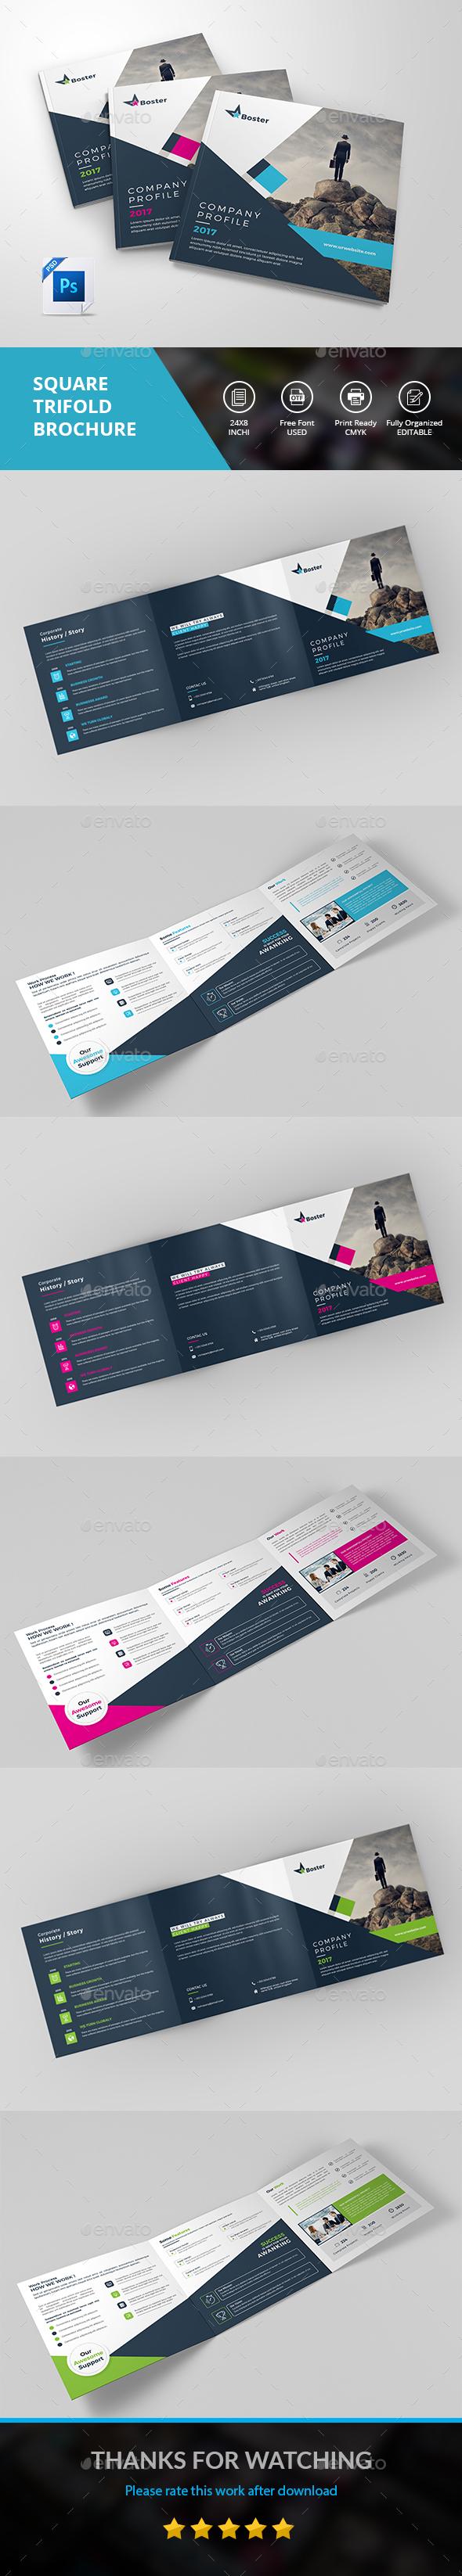 Square Tri-fold - Corporate Brochures